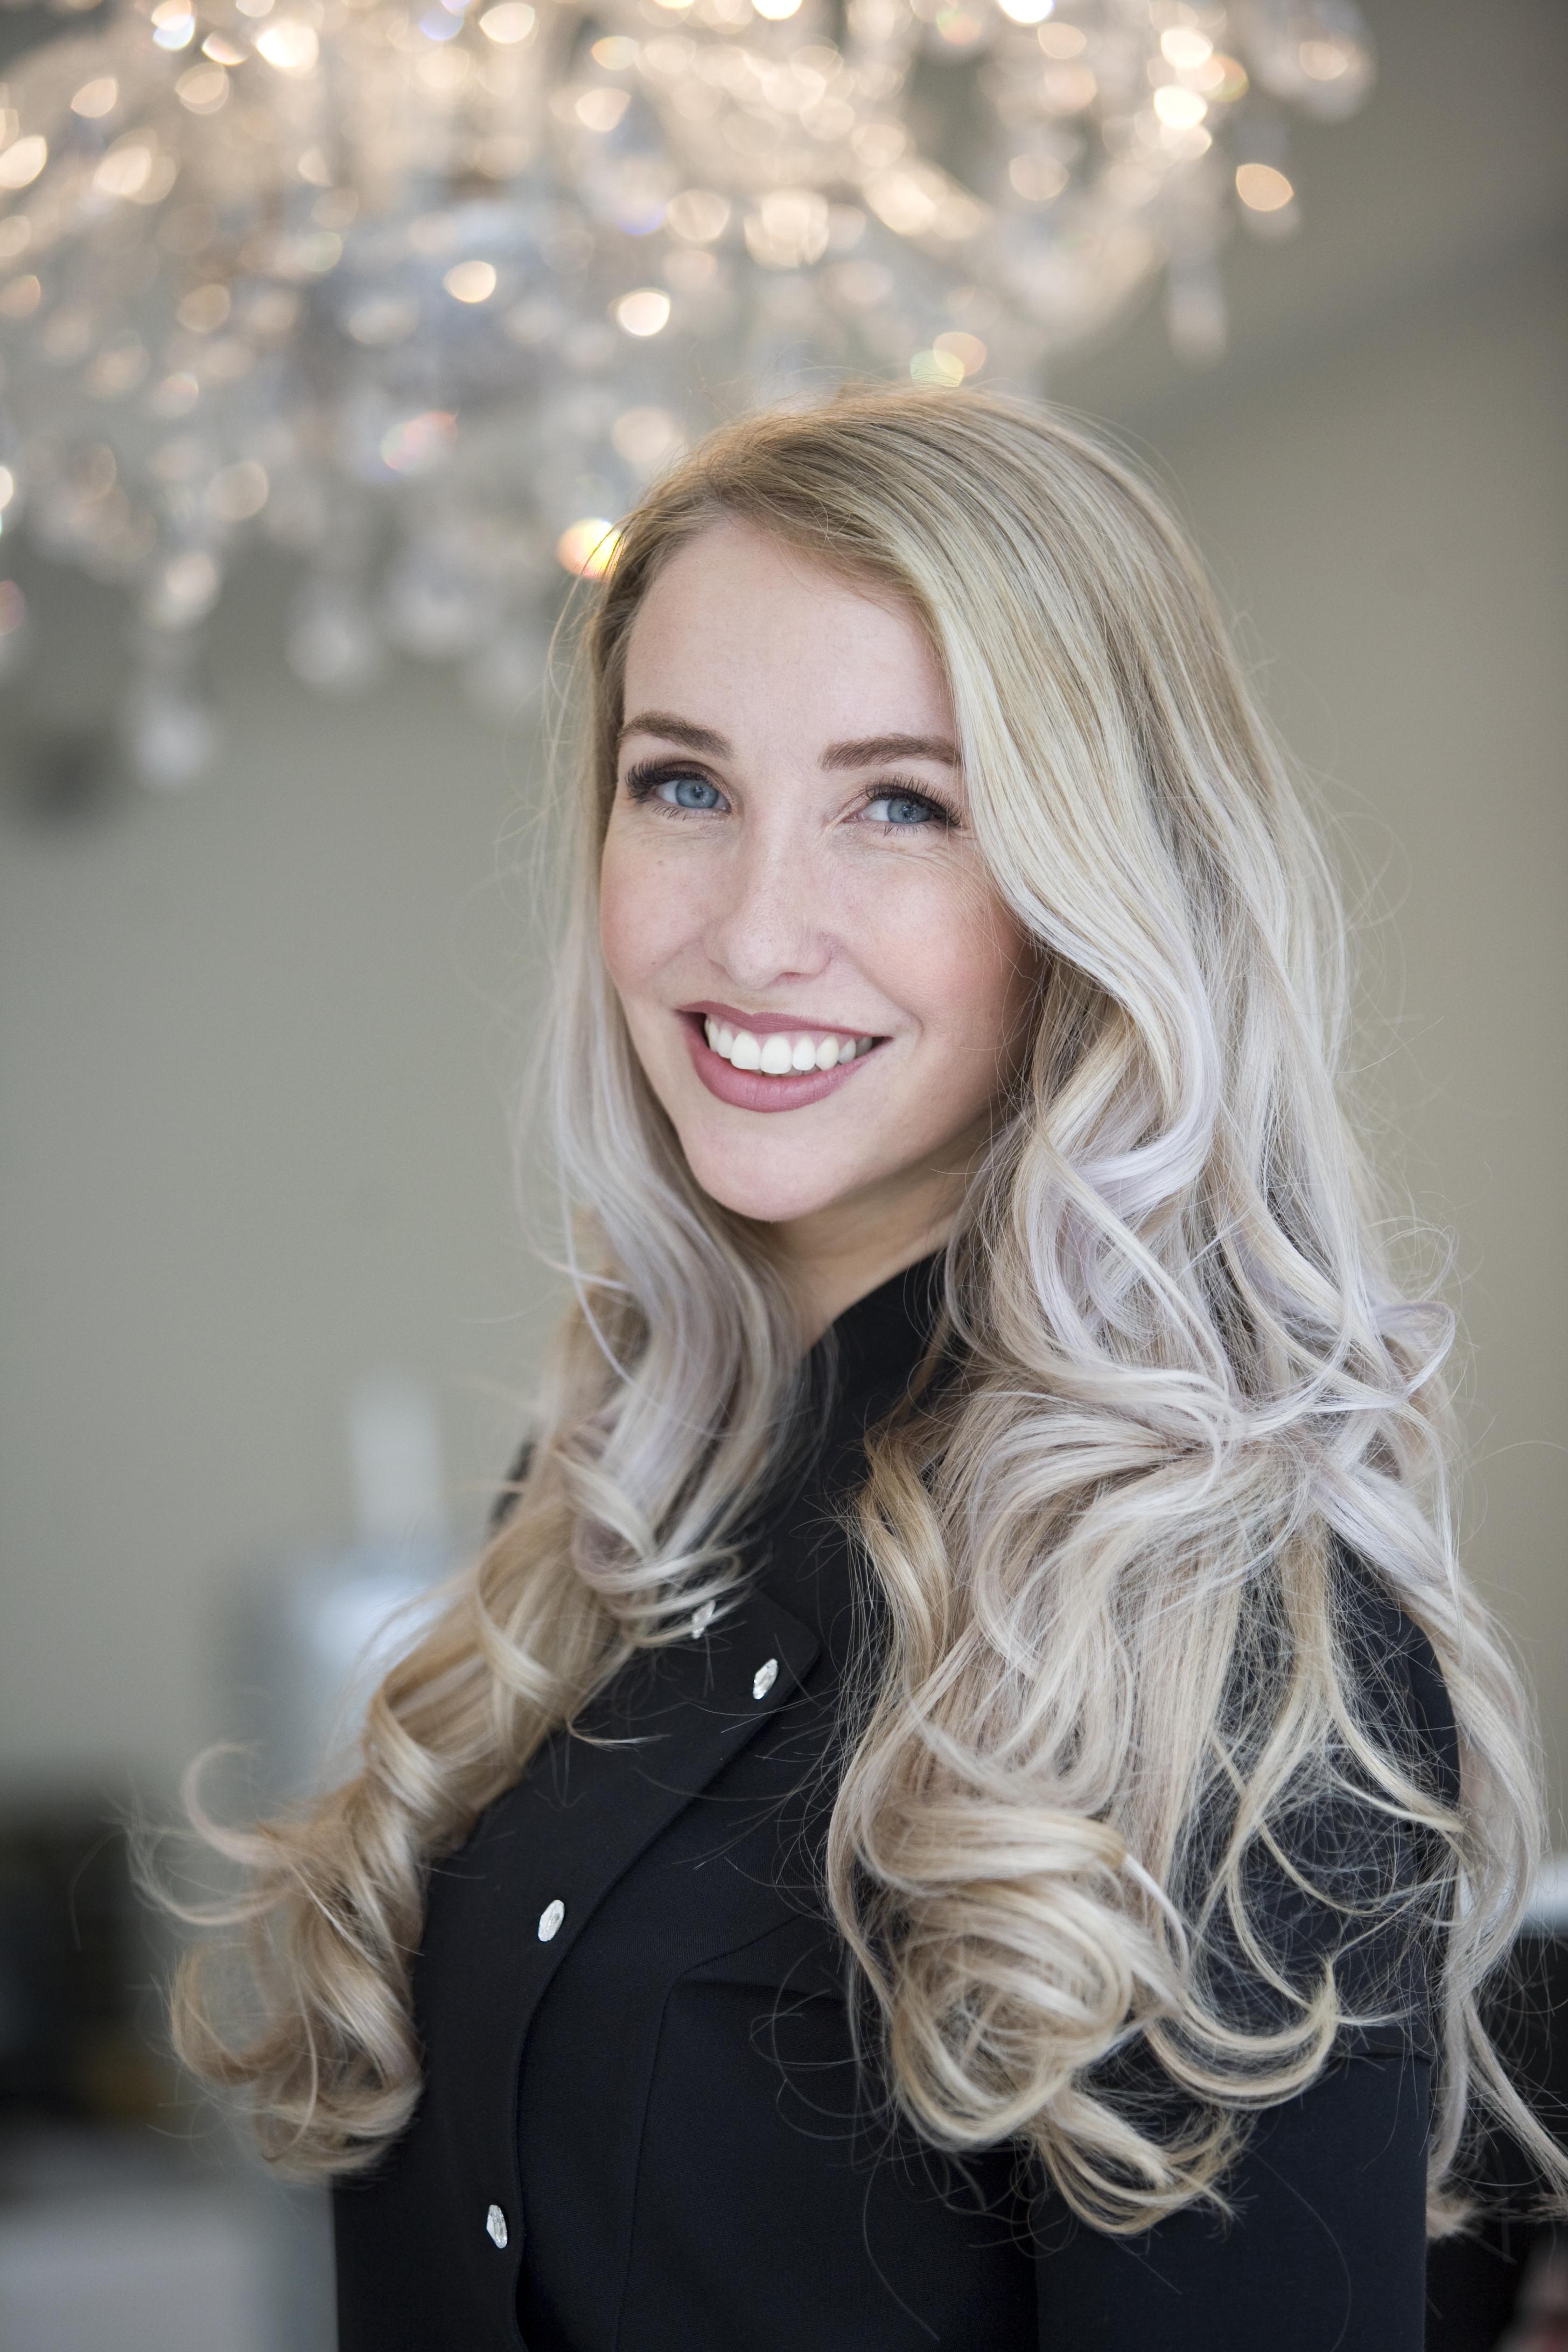 Lindsay <br/>Werkt bij Wimperextensions Den Bosch sinds 2017